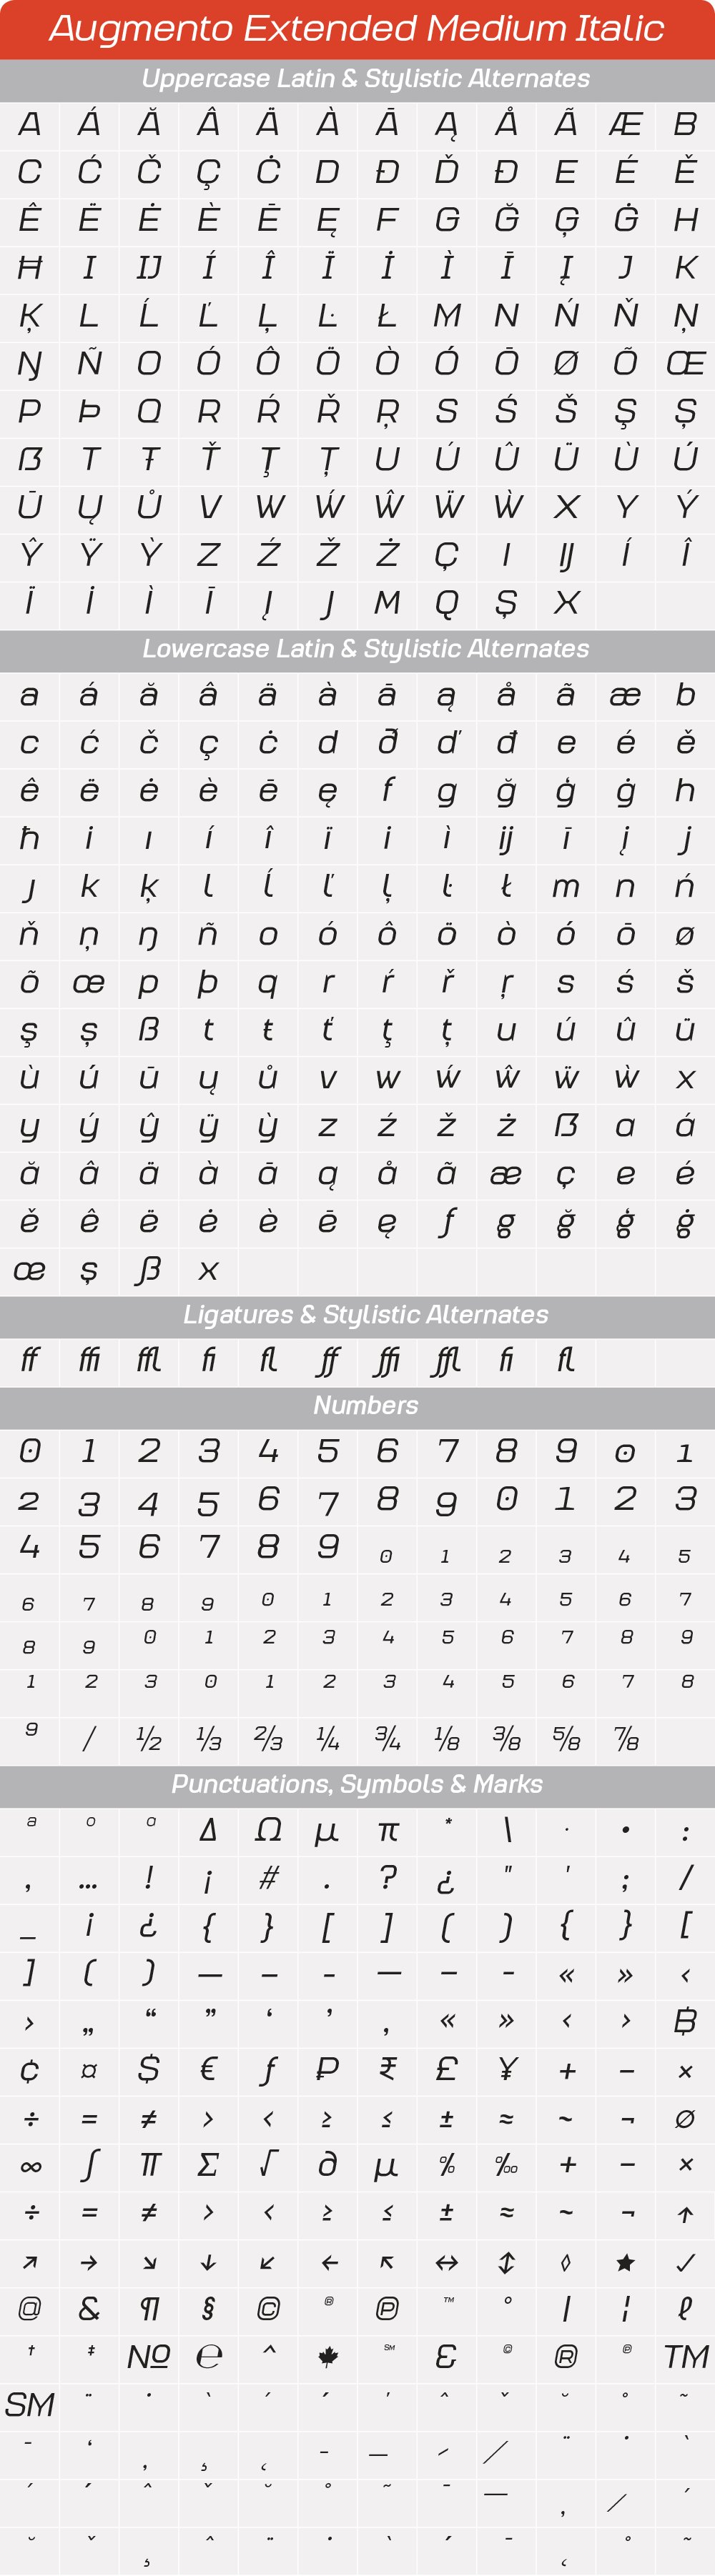 Extended Medium ItalicAugmento-GlyphTable.png